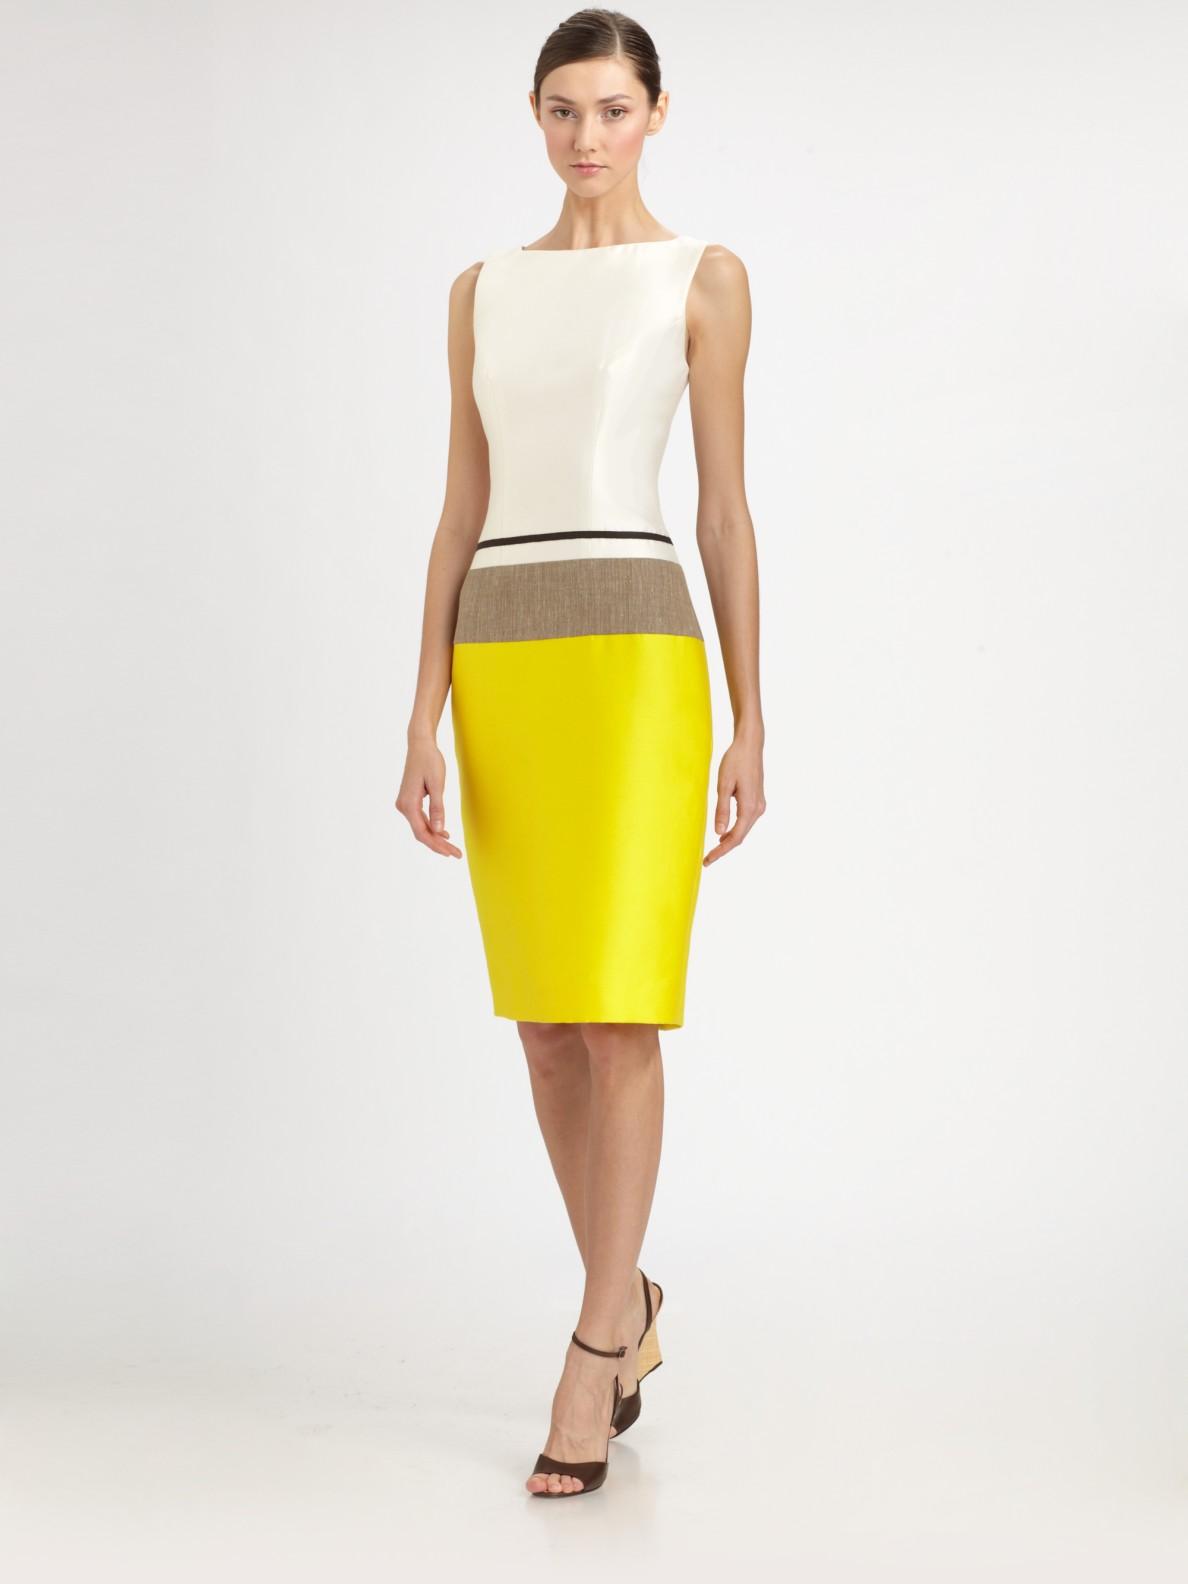 Lyst Carolina Herrera Colorblock Dress In White